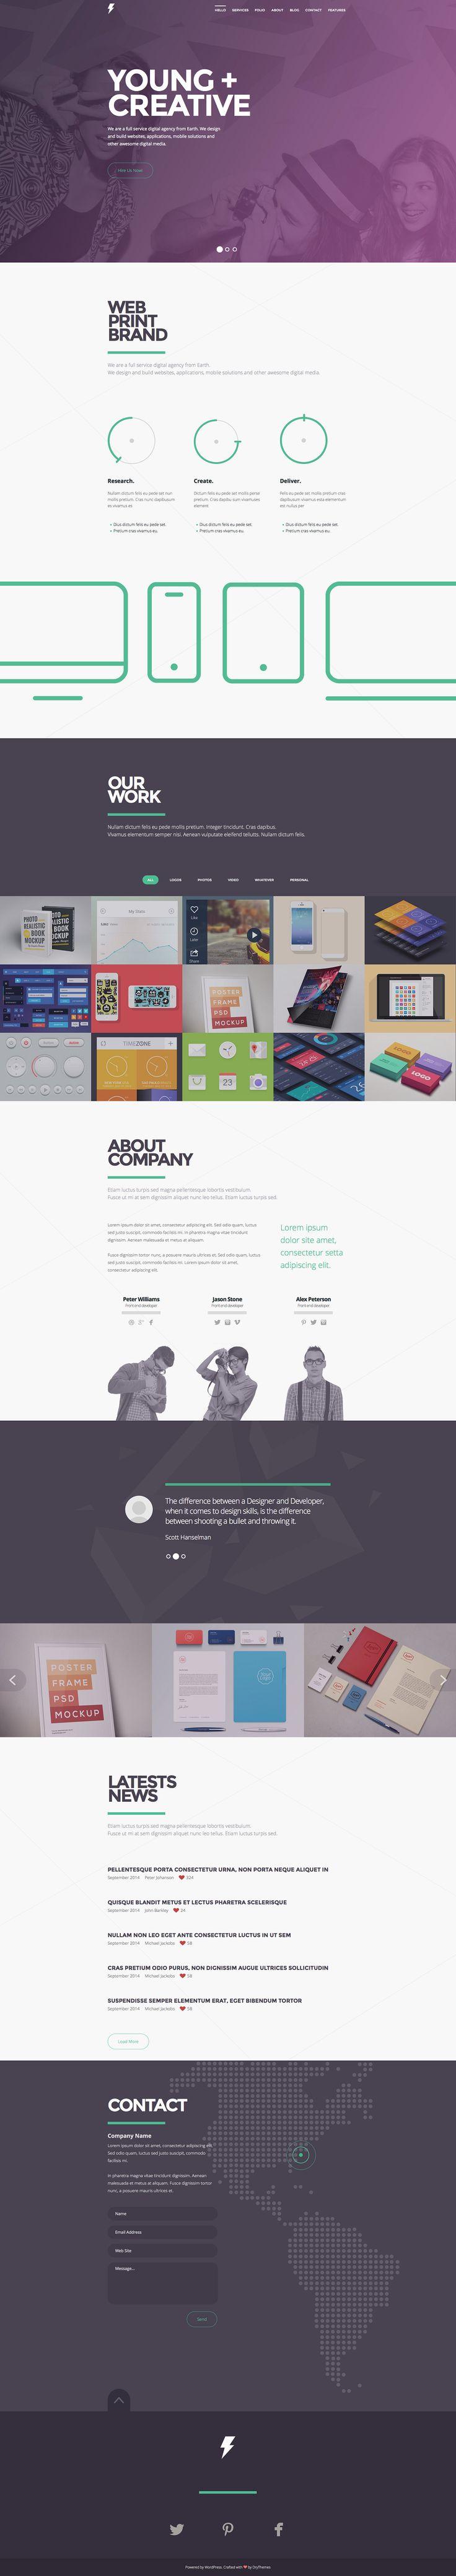 Sensa - One Page Responsive Wordpress Theme #web #design